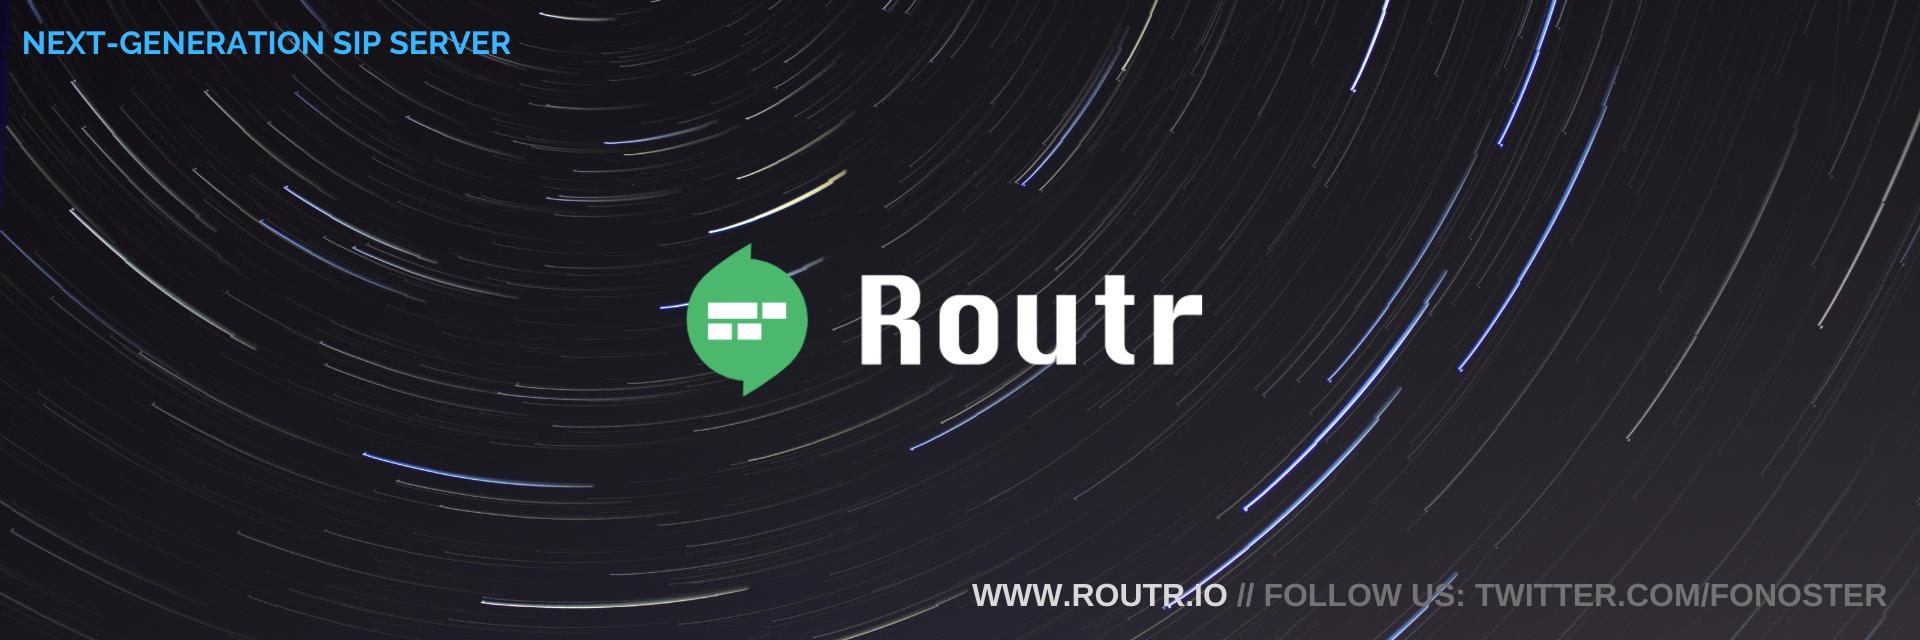 Routr Server banner